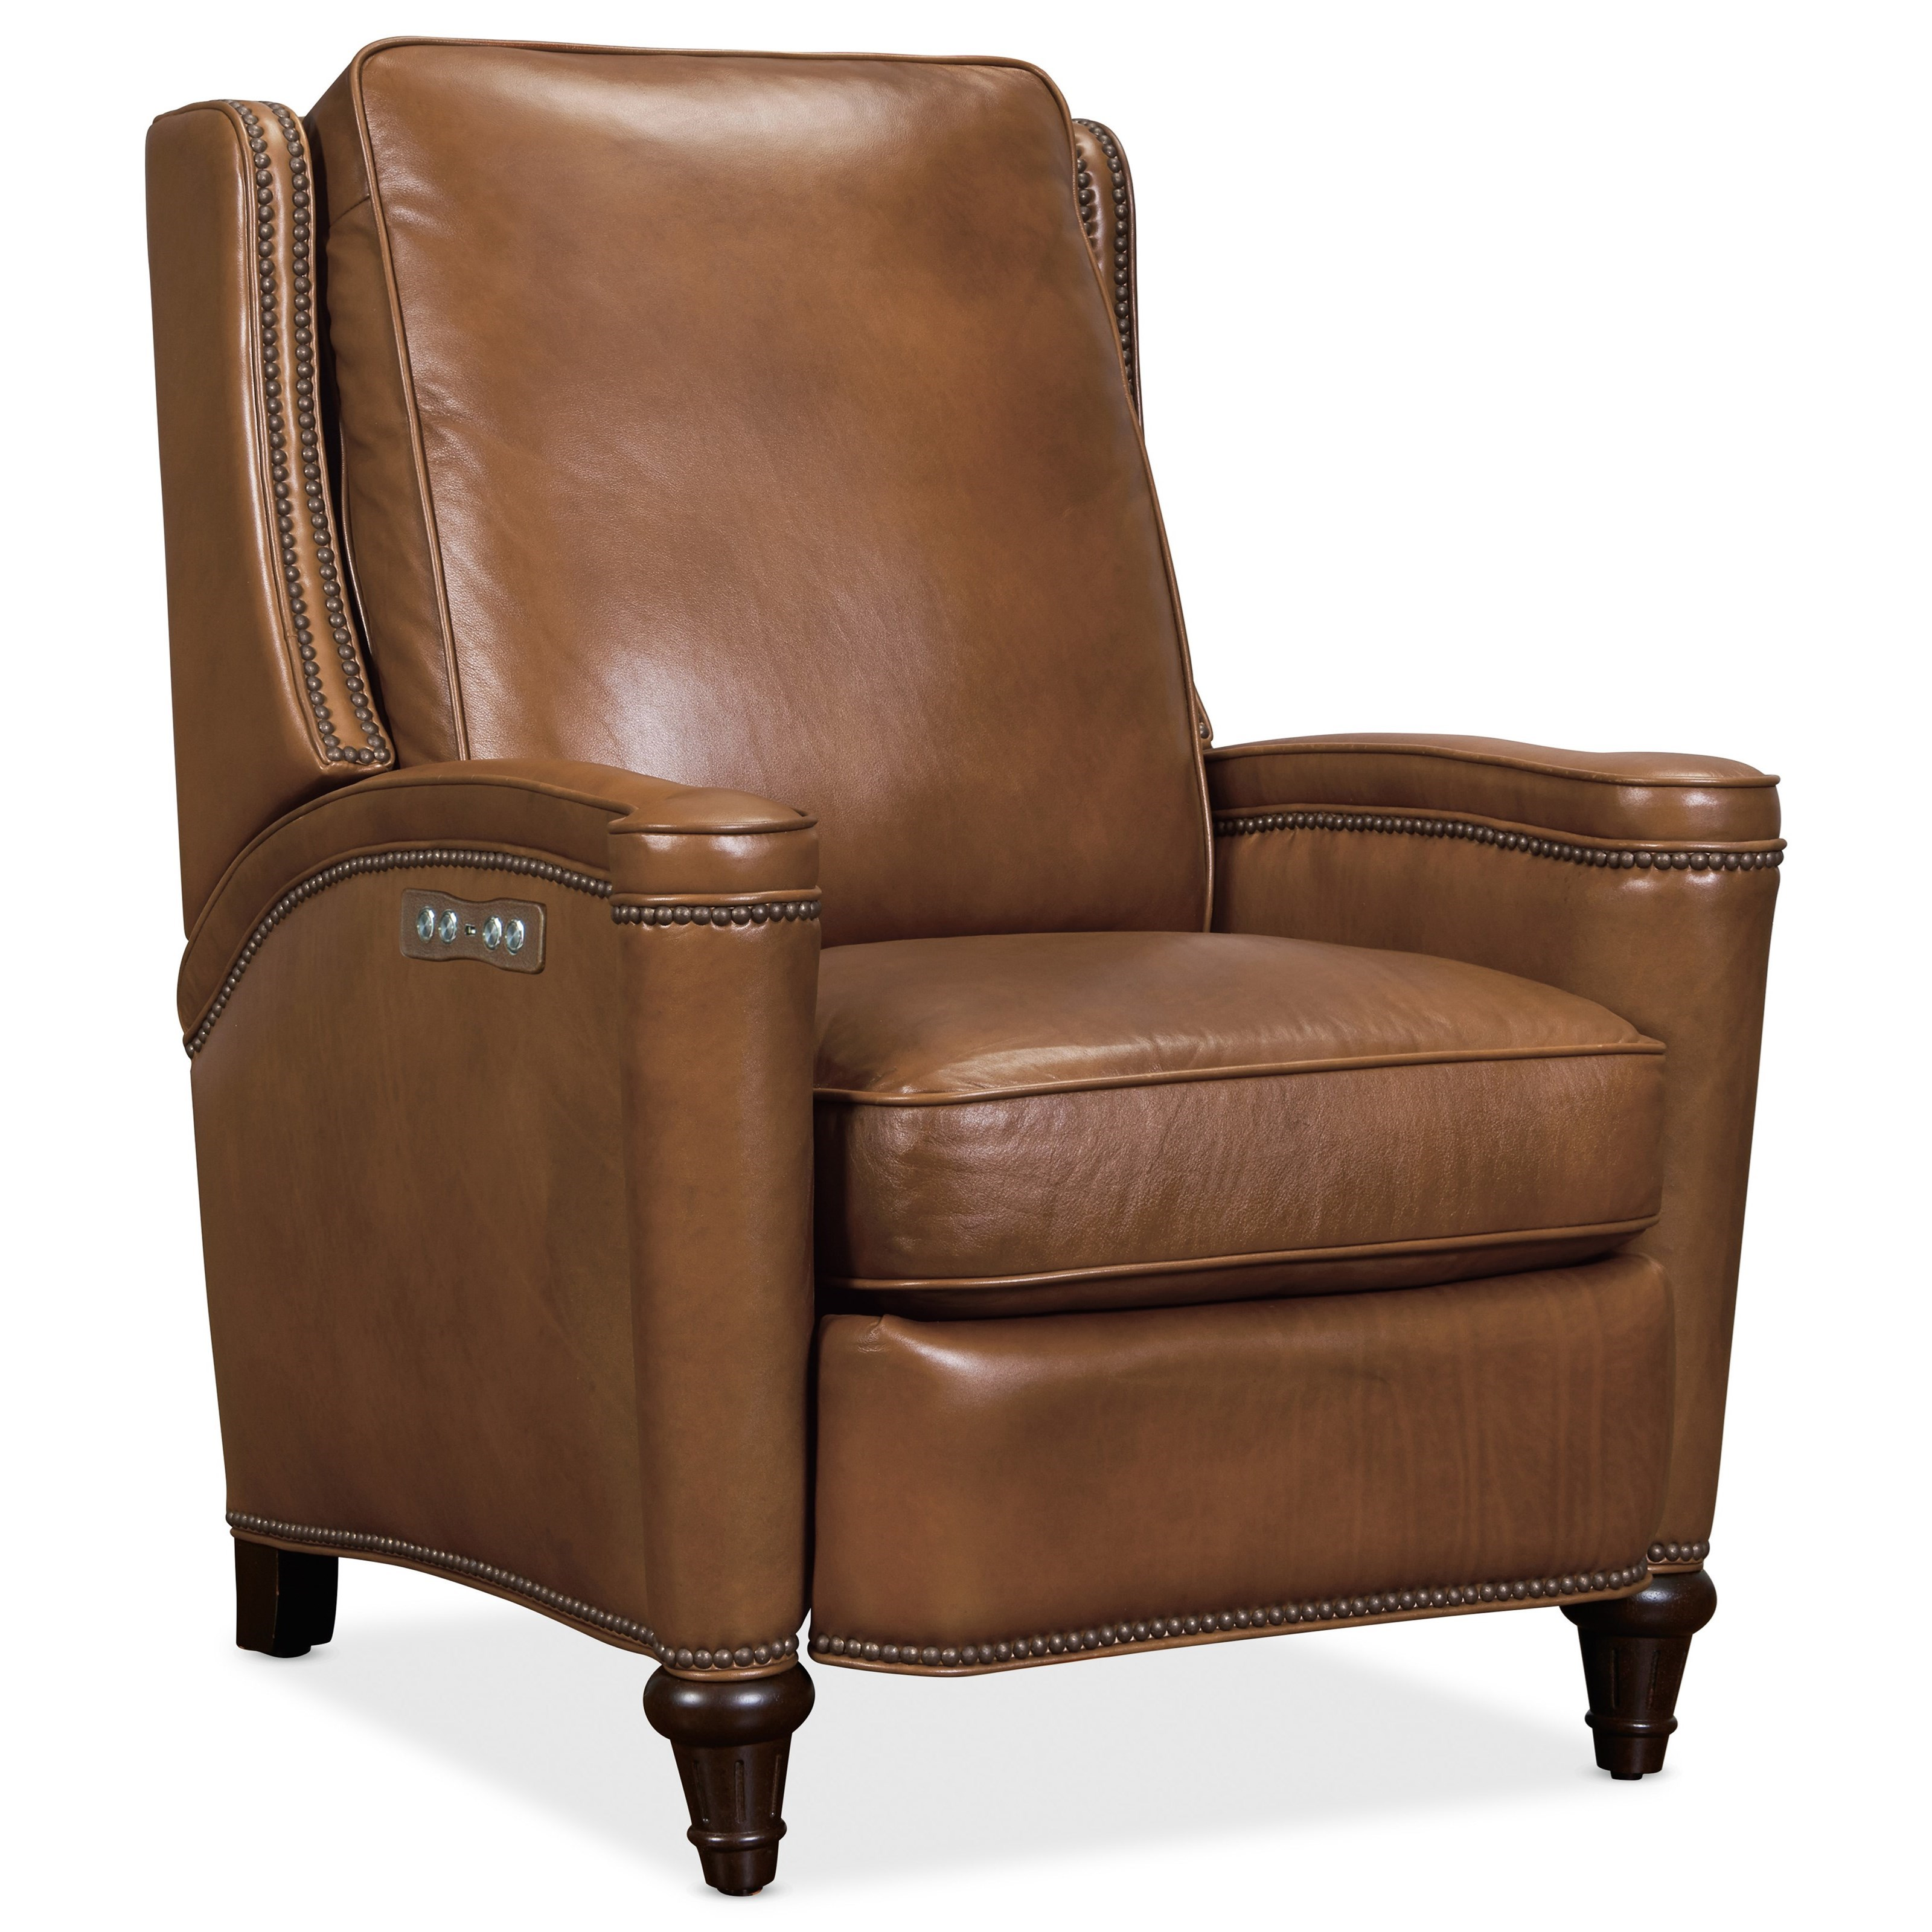 Rylea Power Recliner w/ Power Headrest by Hooker Furniture at Baer's Furniture